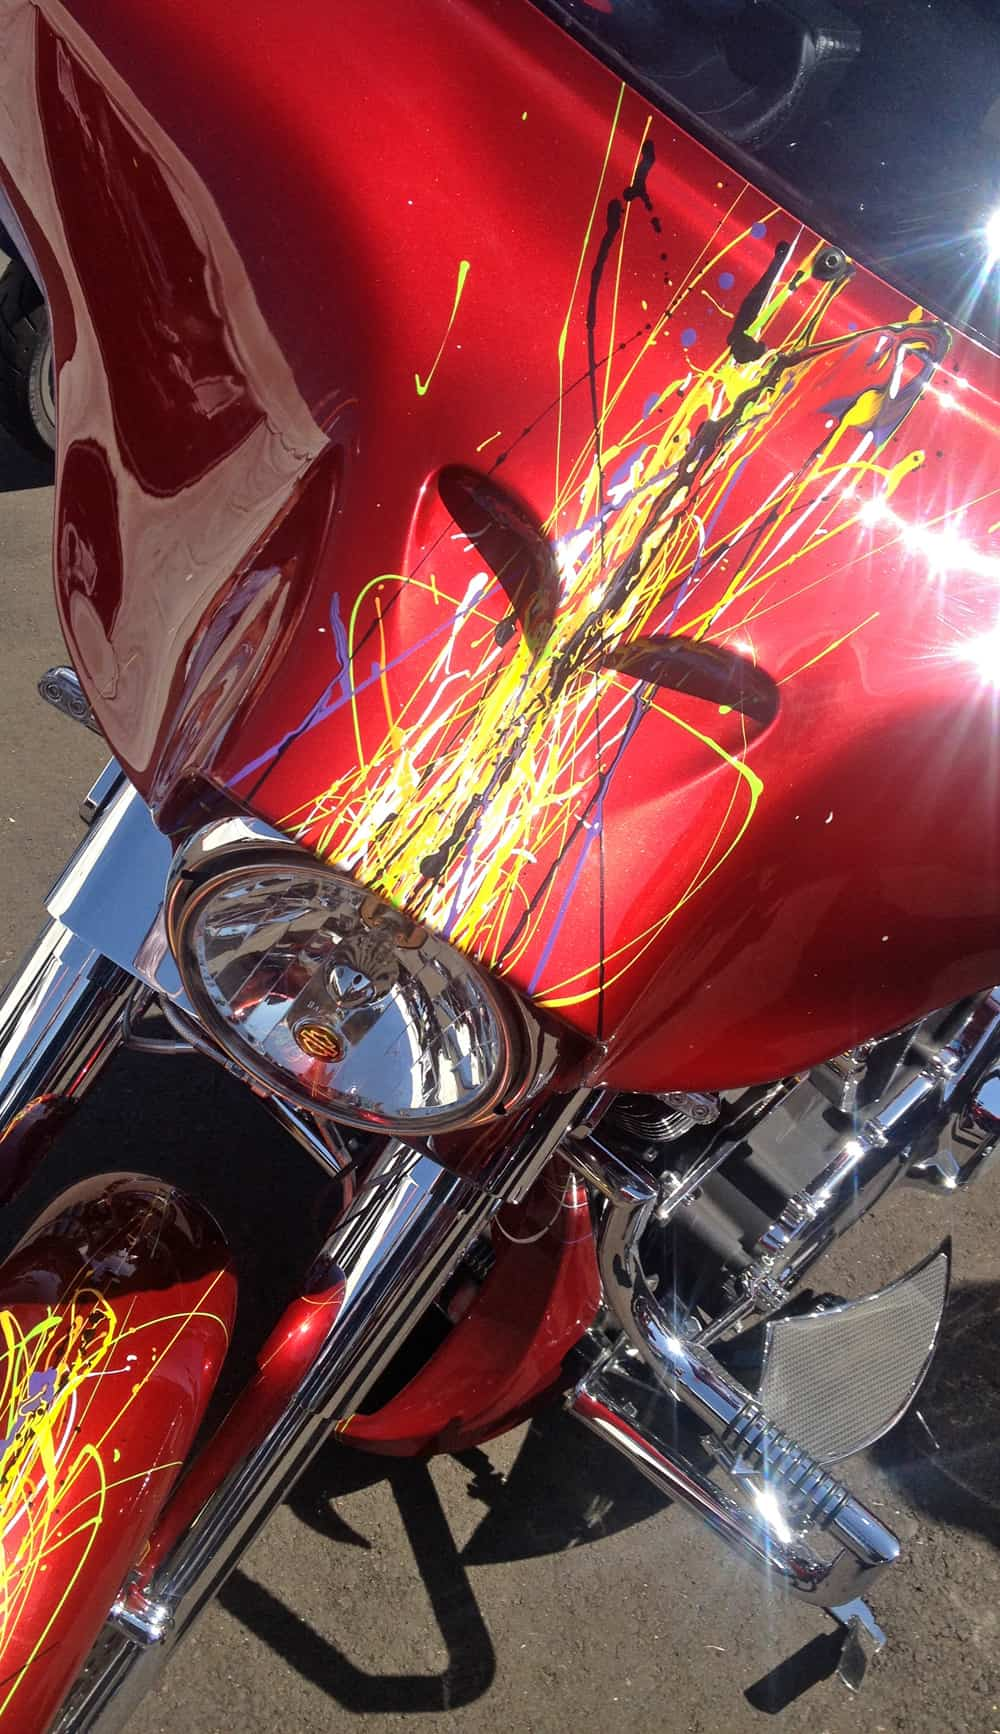 Mark Brodie Splatter Paint at AZ Bike Week 2014, Cave Creek, AZ